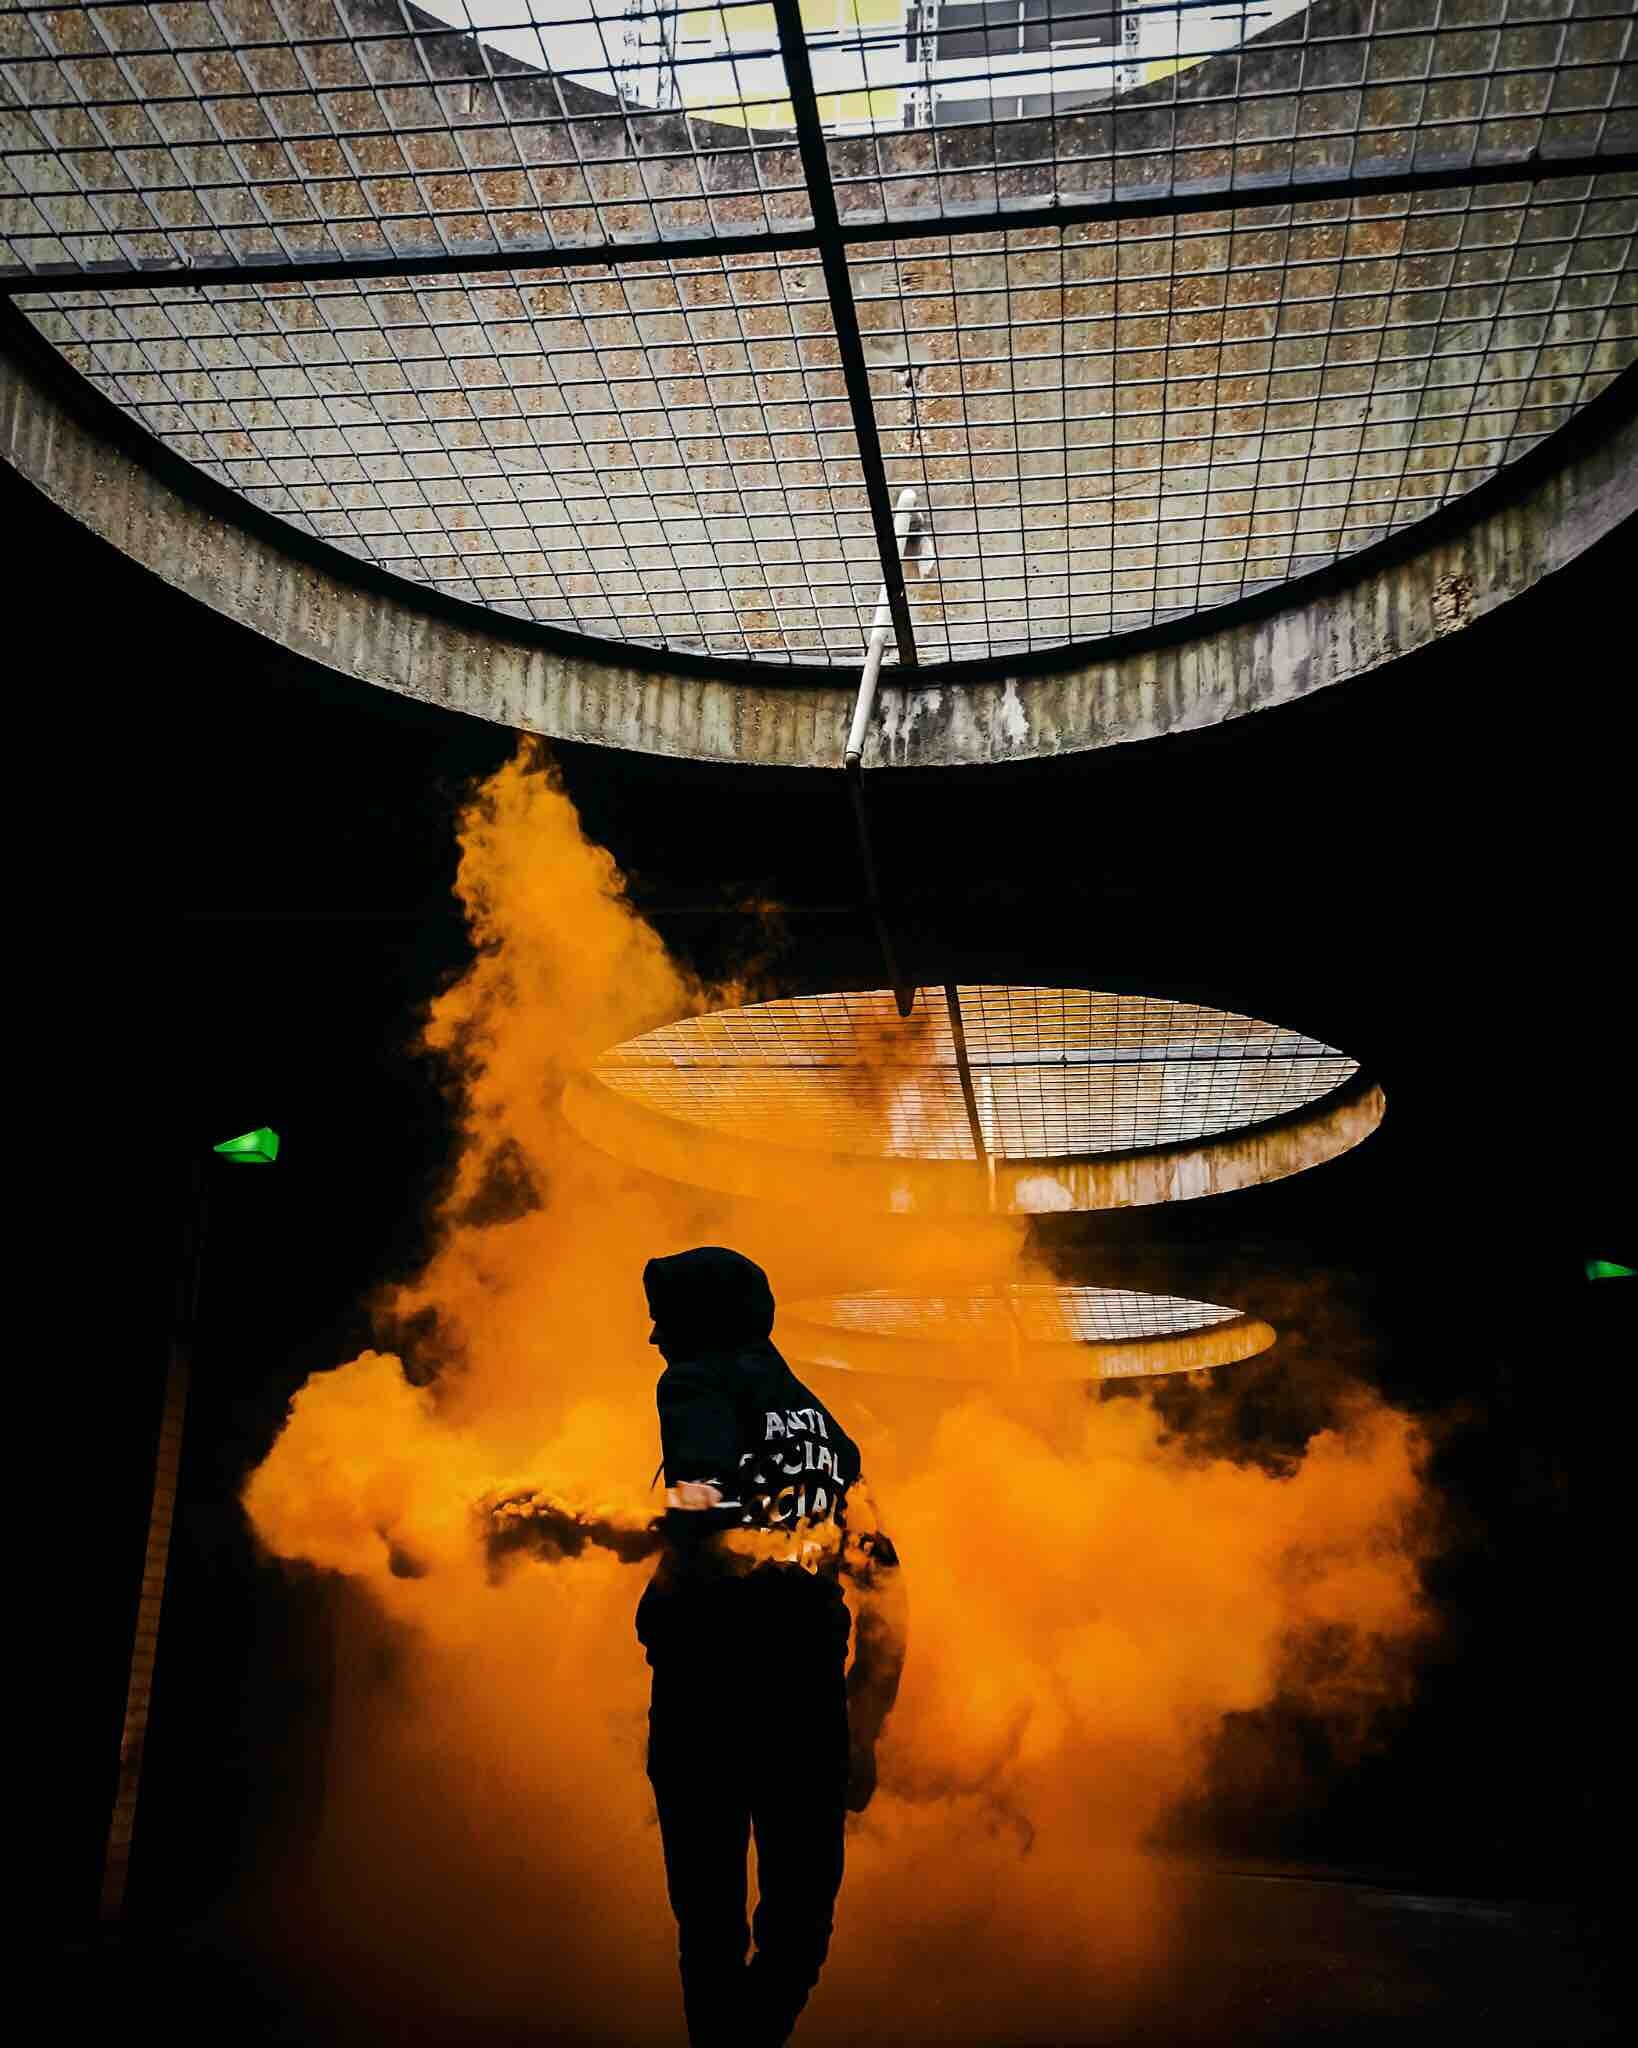 Silhouette of person in a hood running through orange smoke underground